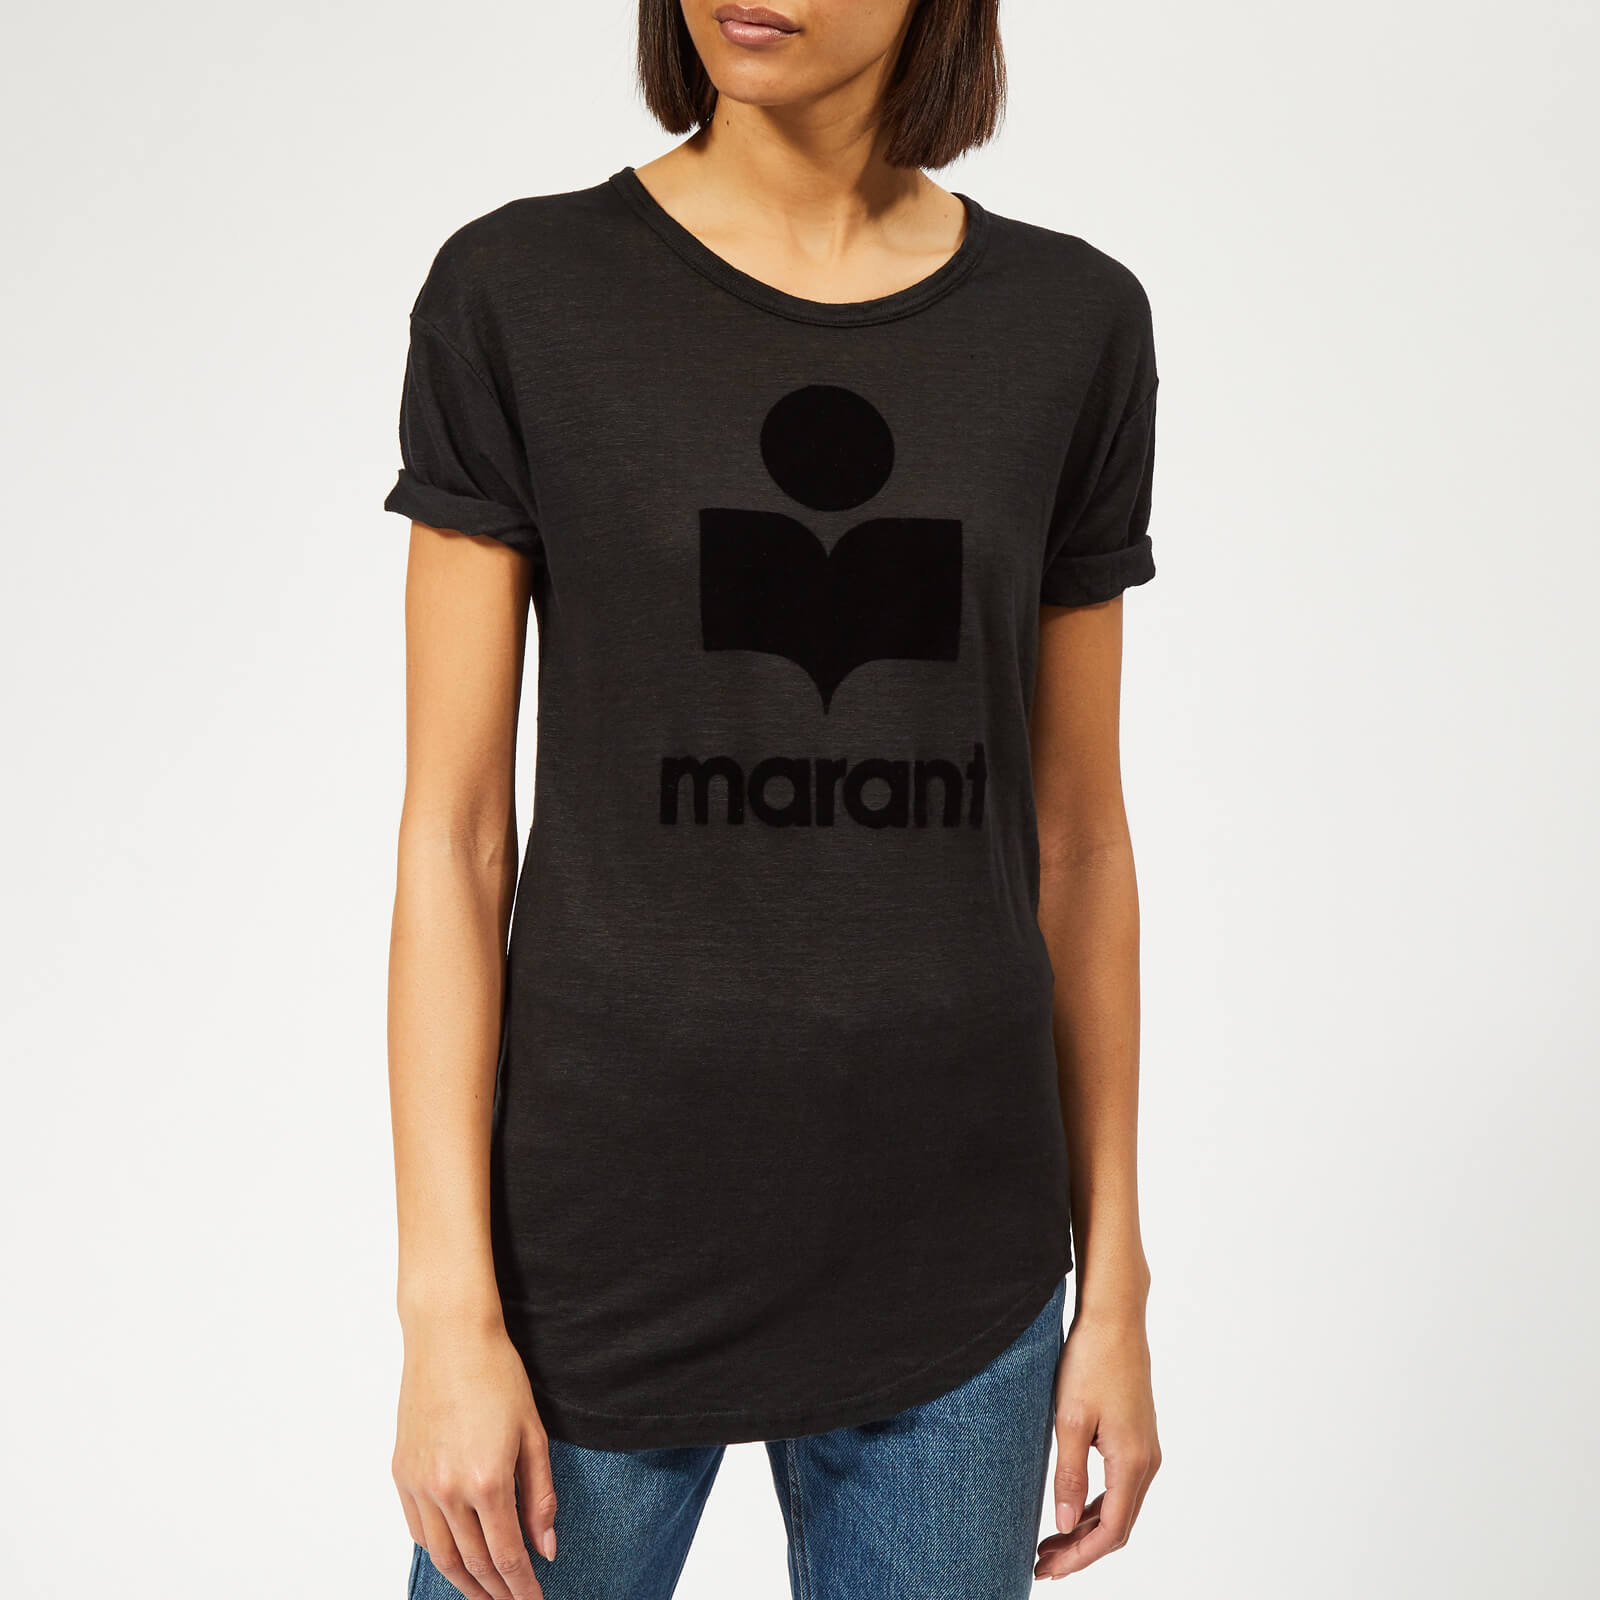 c20b3f328f131 Isabel Marant Étoile Women s Koldi T-Shirt - Black - Free UK Delivery over  £50